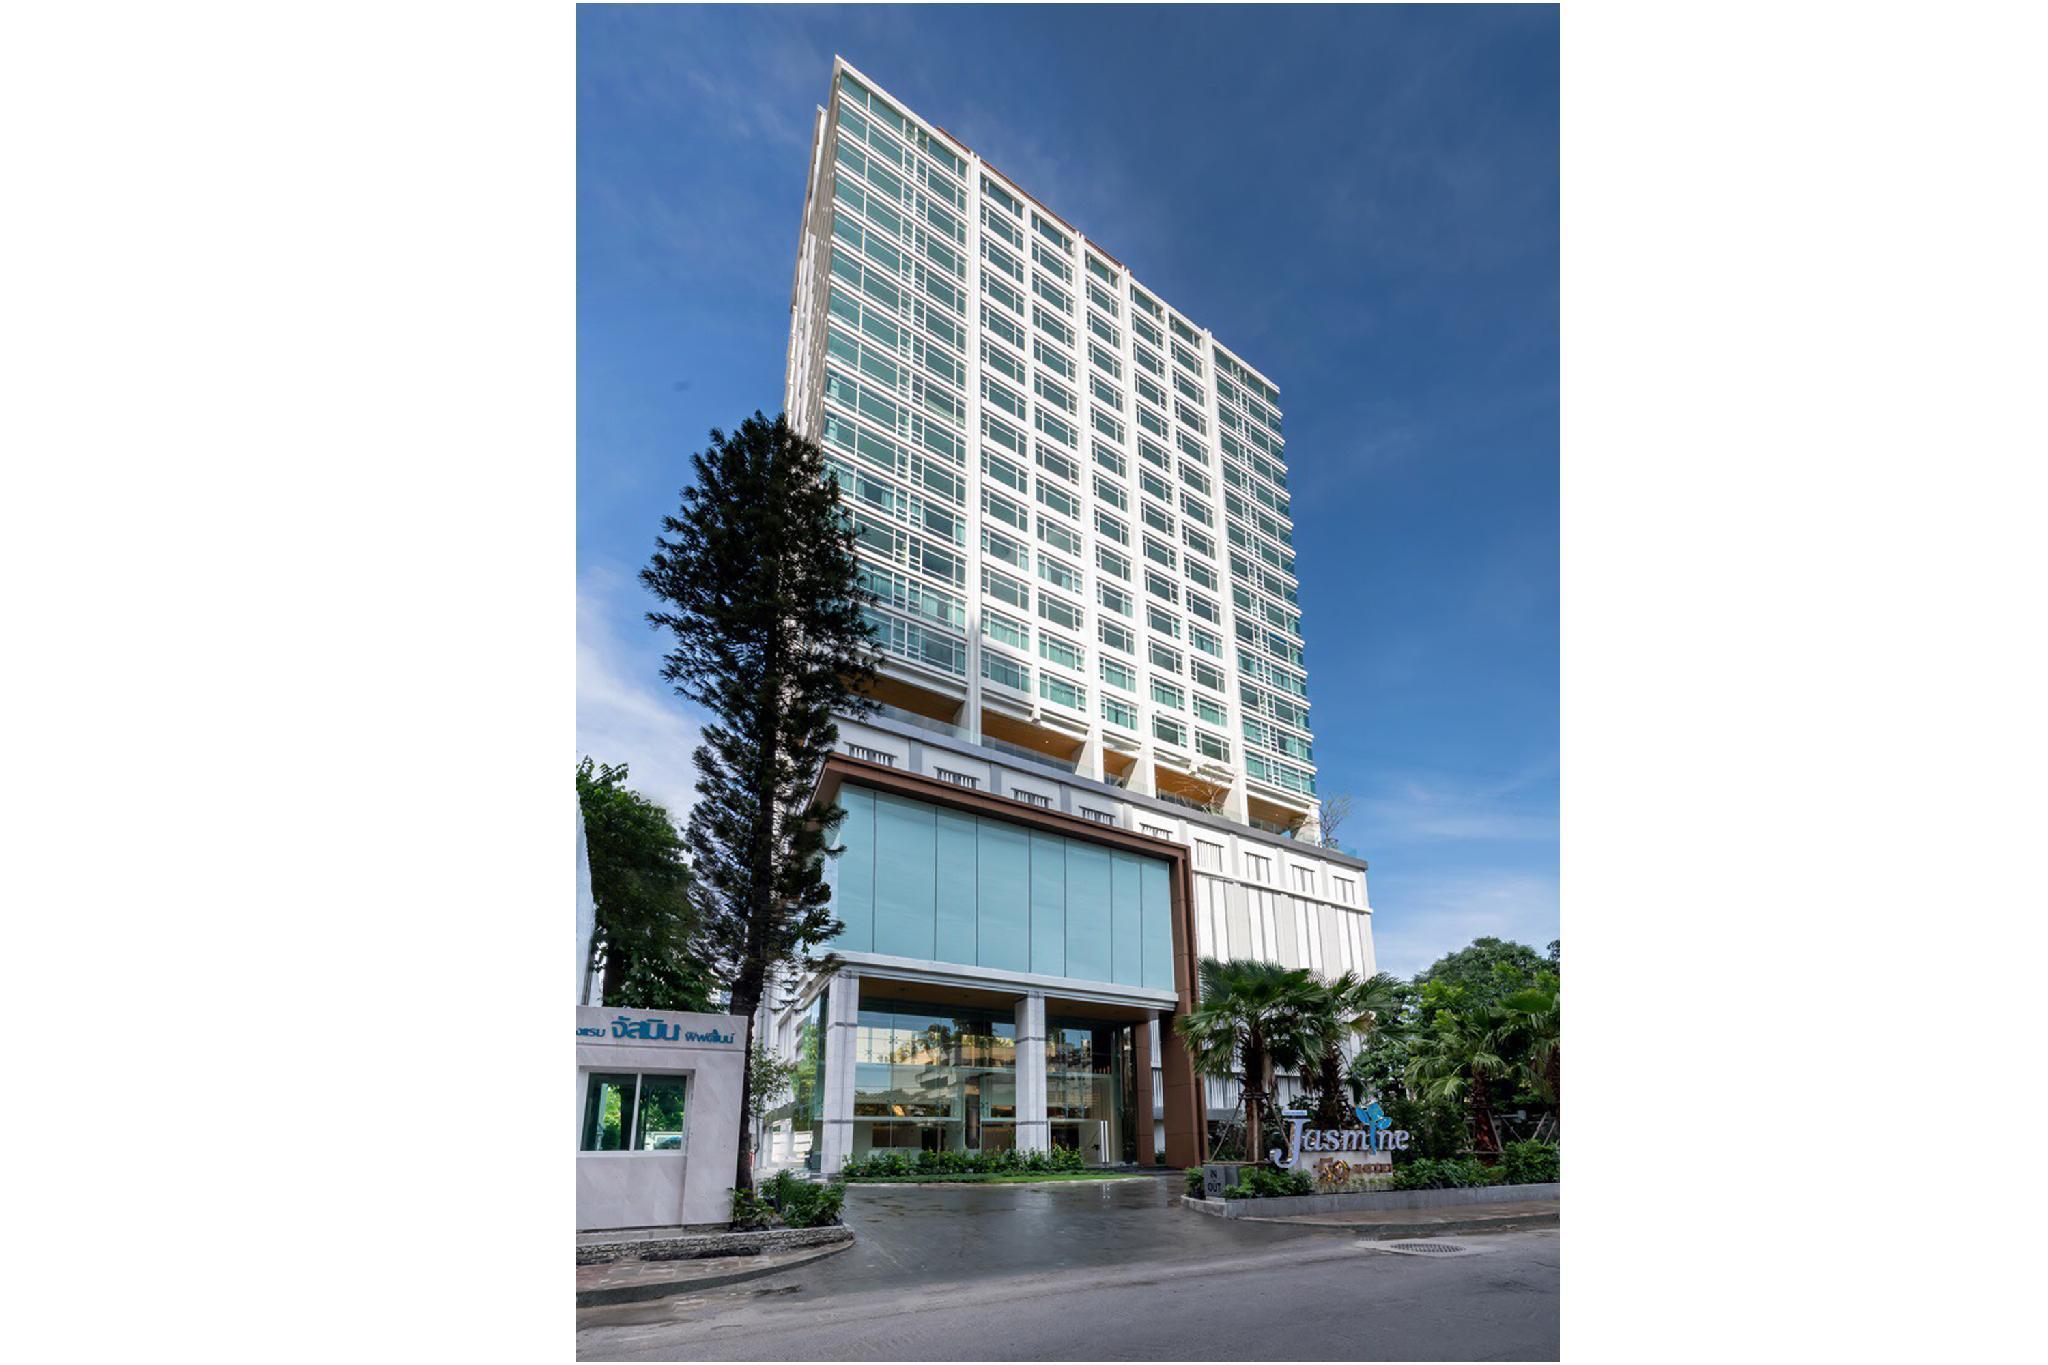 Jasmine 59 Hotel โรงแรมจัสมิน 59